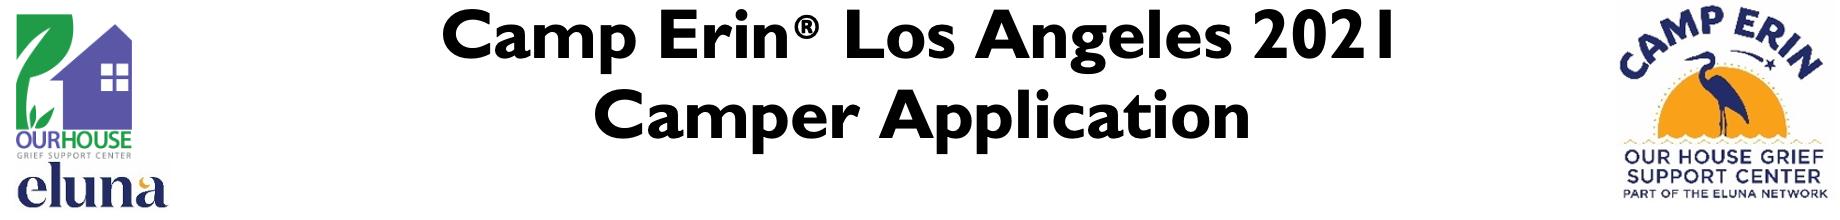 Camp Erin Los Angeles 2021 Camper Application